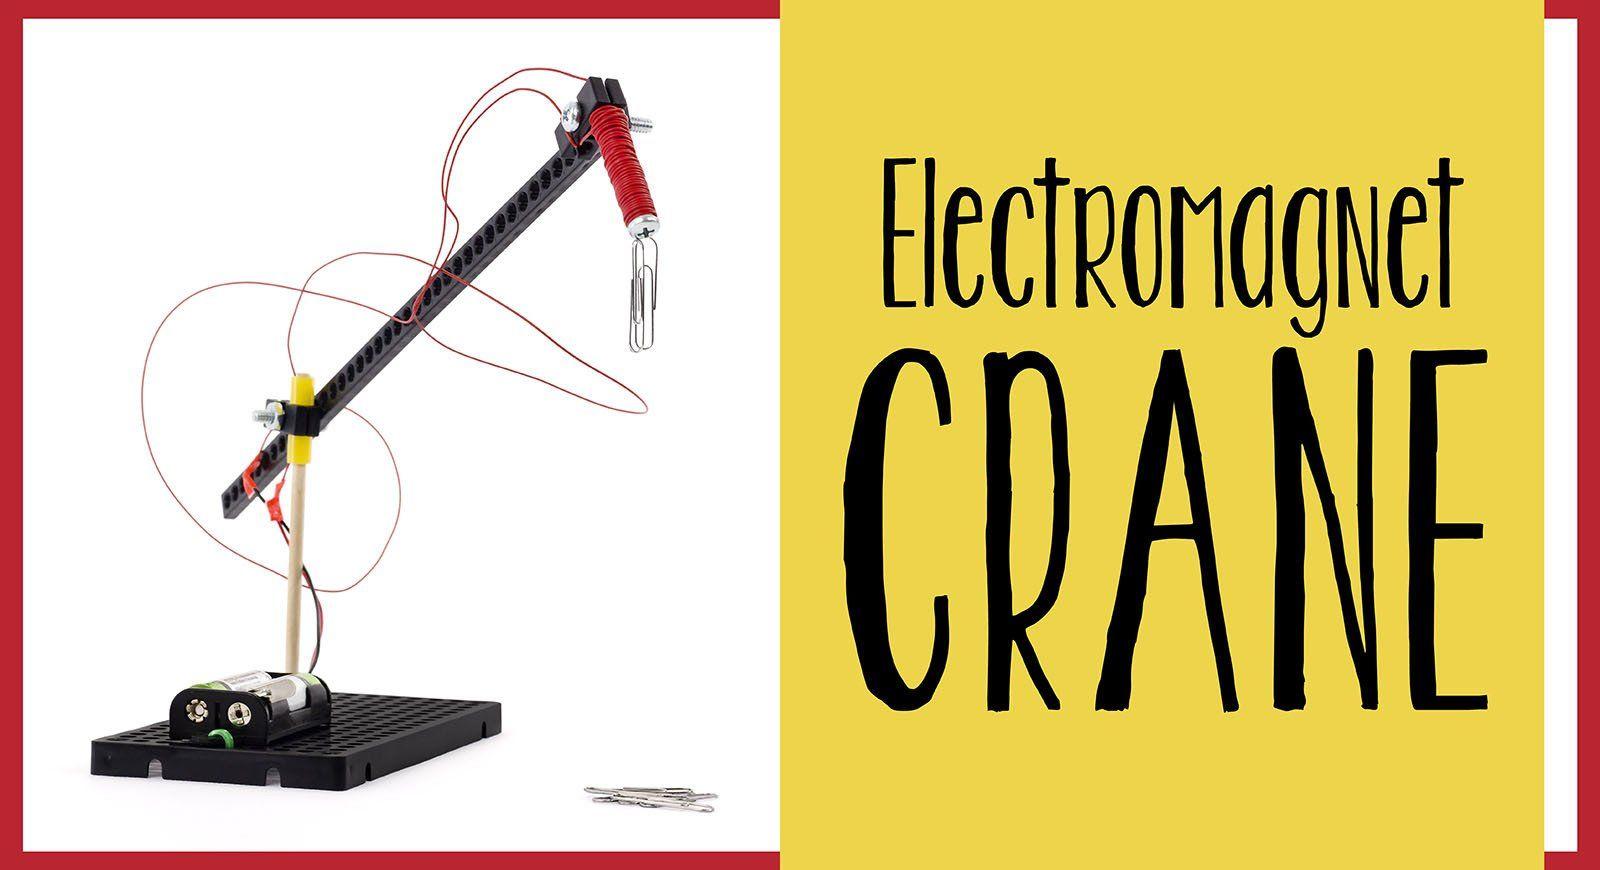 Electromagnet Crane Activity Documents Teachergeek Electromagnet Crane Activities [ 870 x 1600 Pixel ]